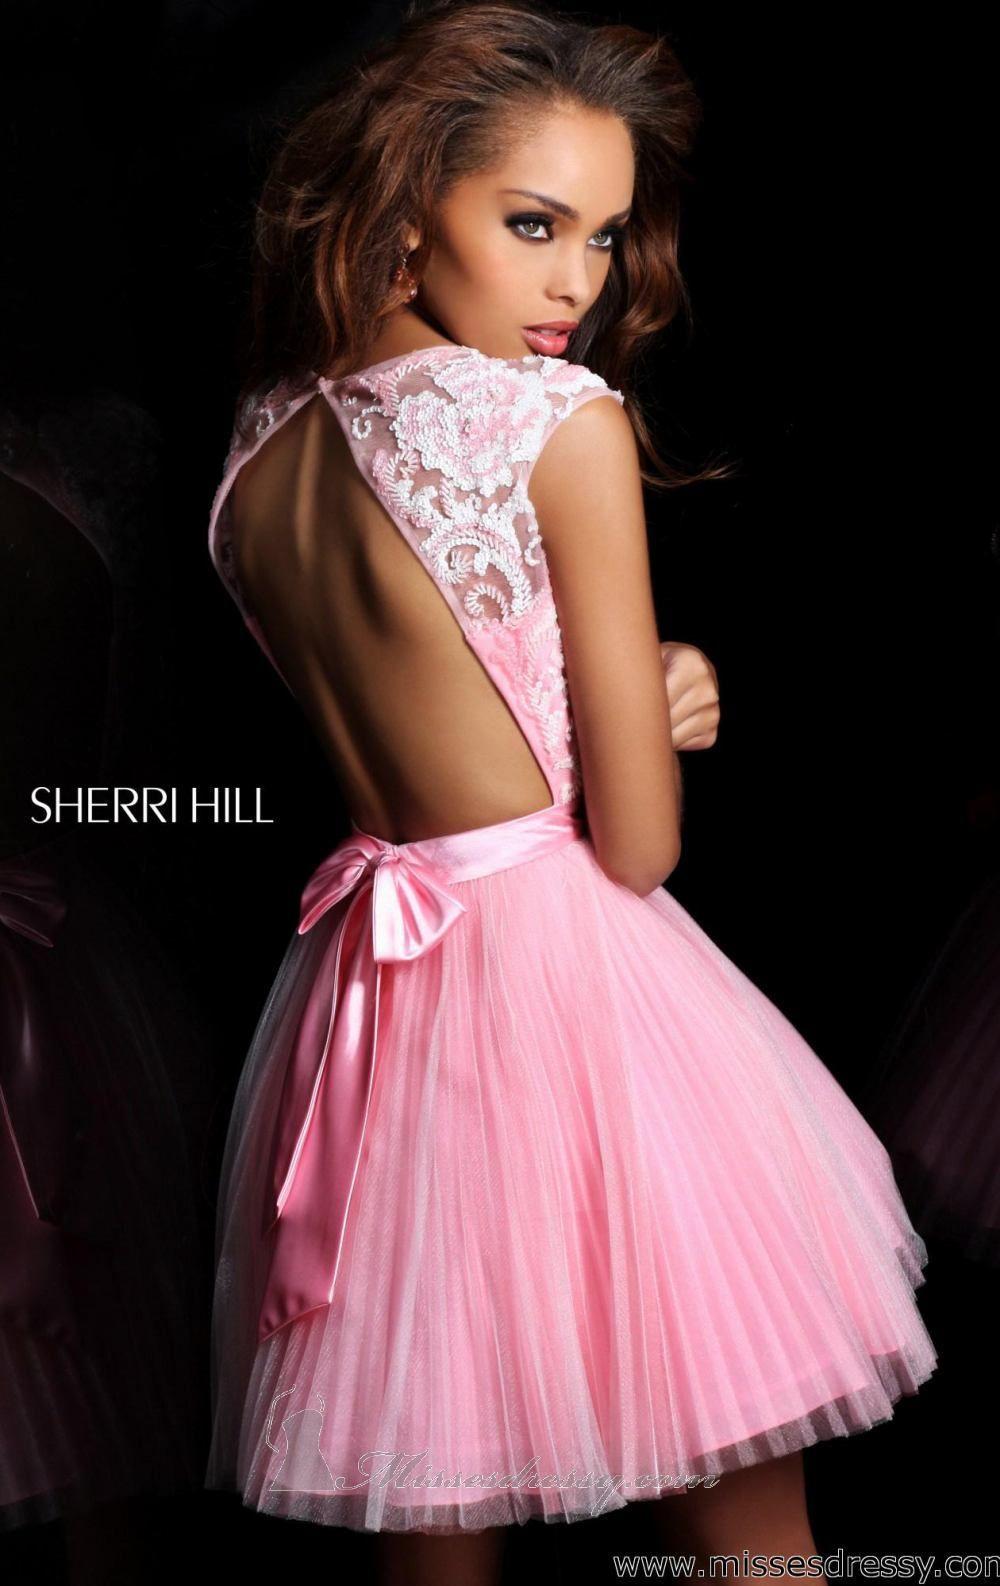 Lace & open back dress. Sherri Hill 21167 Dress - MissesDressy.com ...